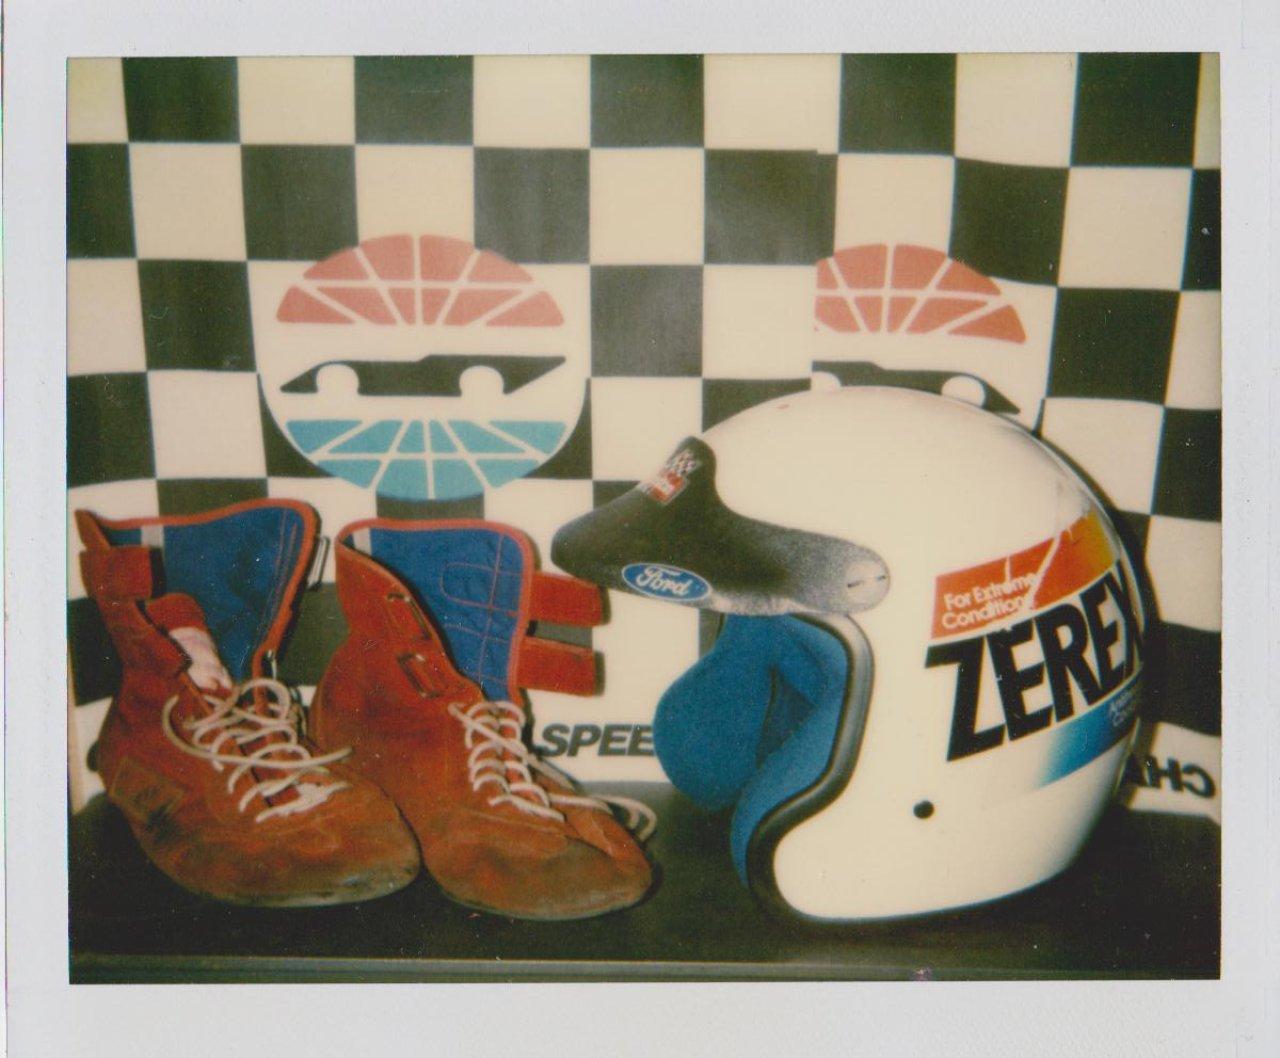 How To Put Antifreeze In Car >> #7 ALAN KULWICKI ZEREX RACE HELMET, RACE SHOES 04 004